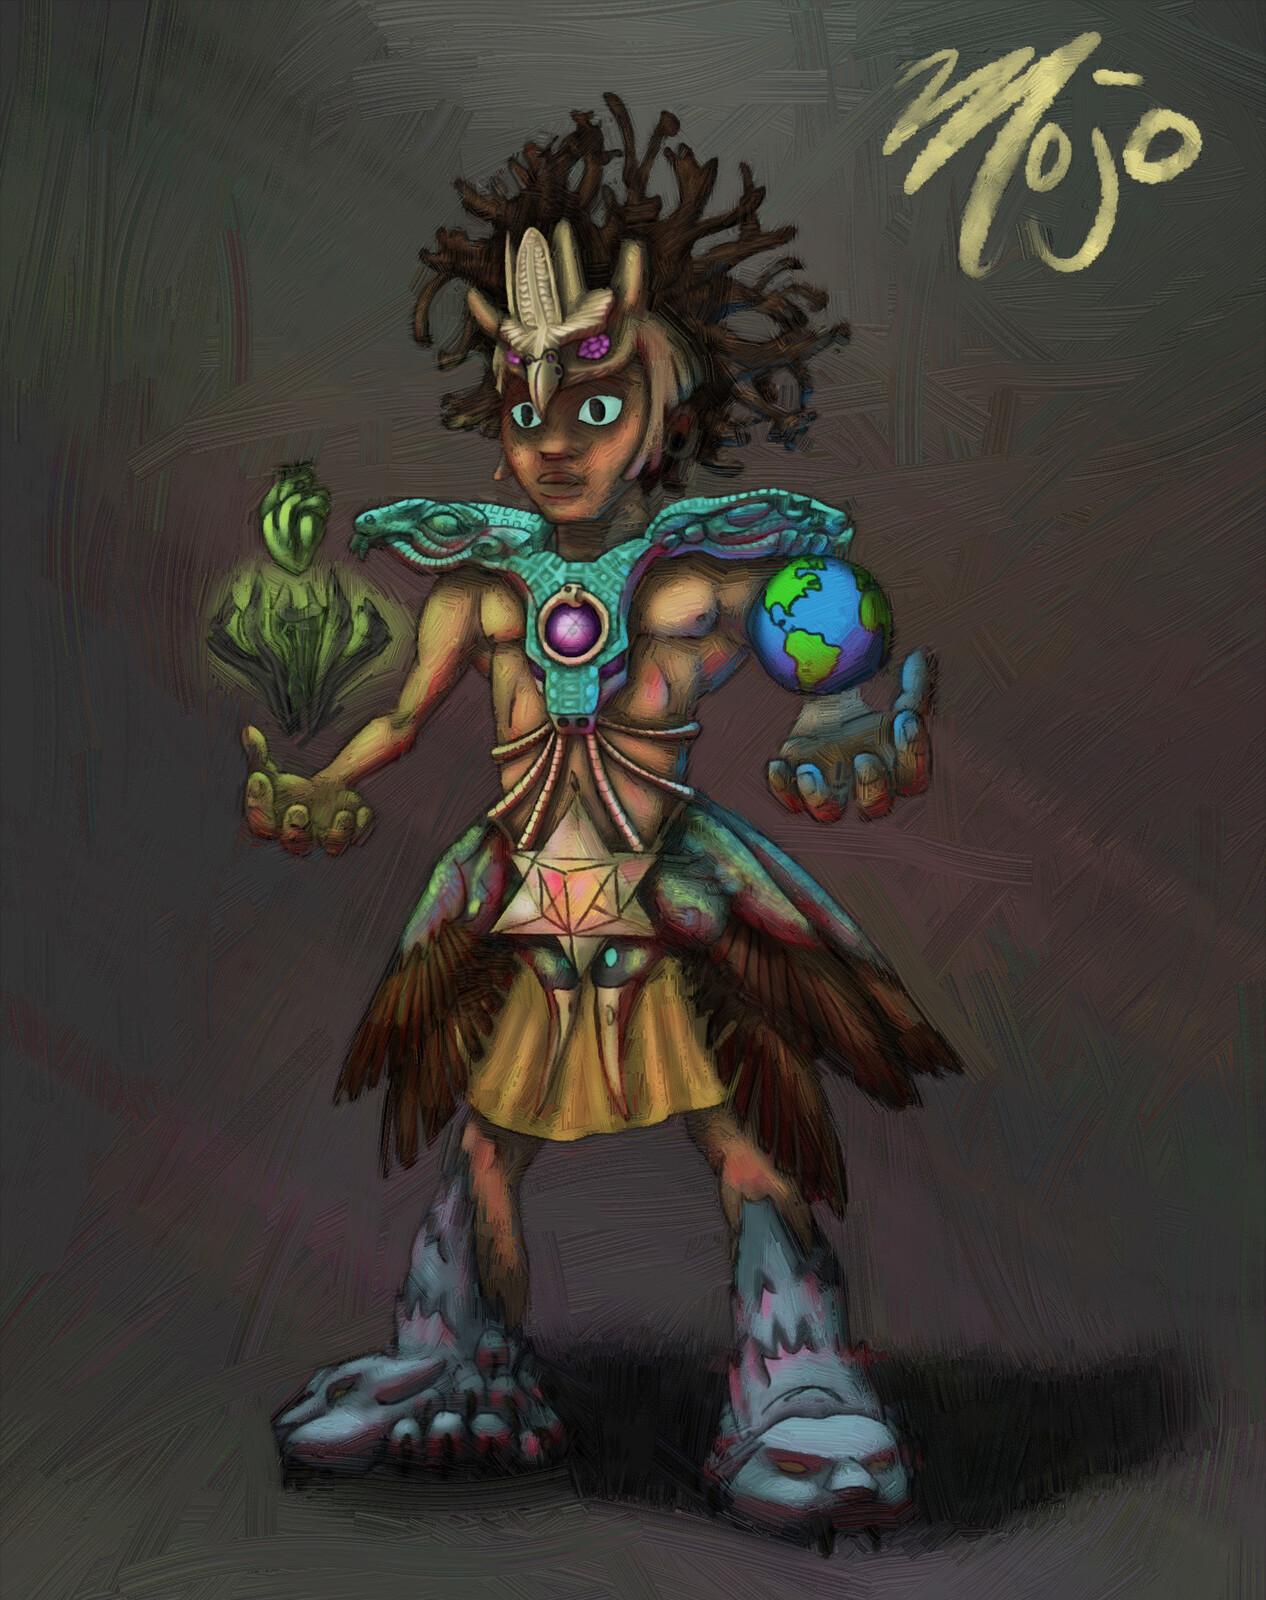 Mojo Character art